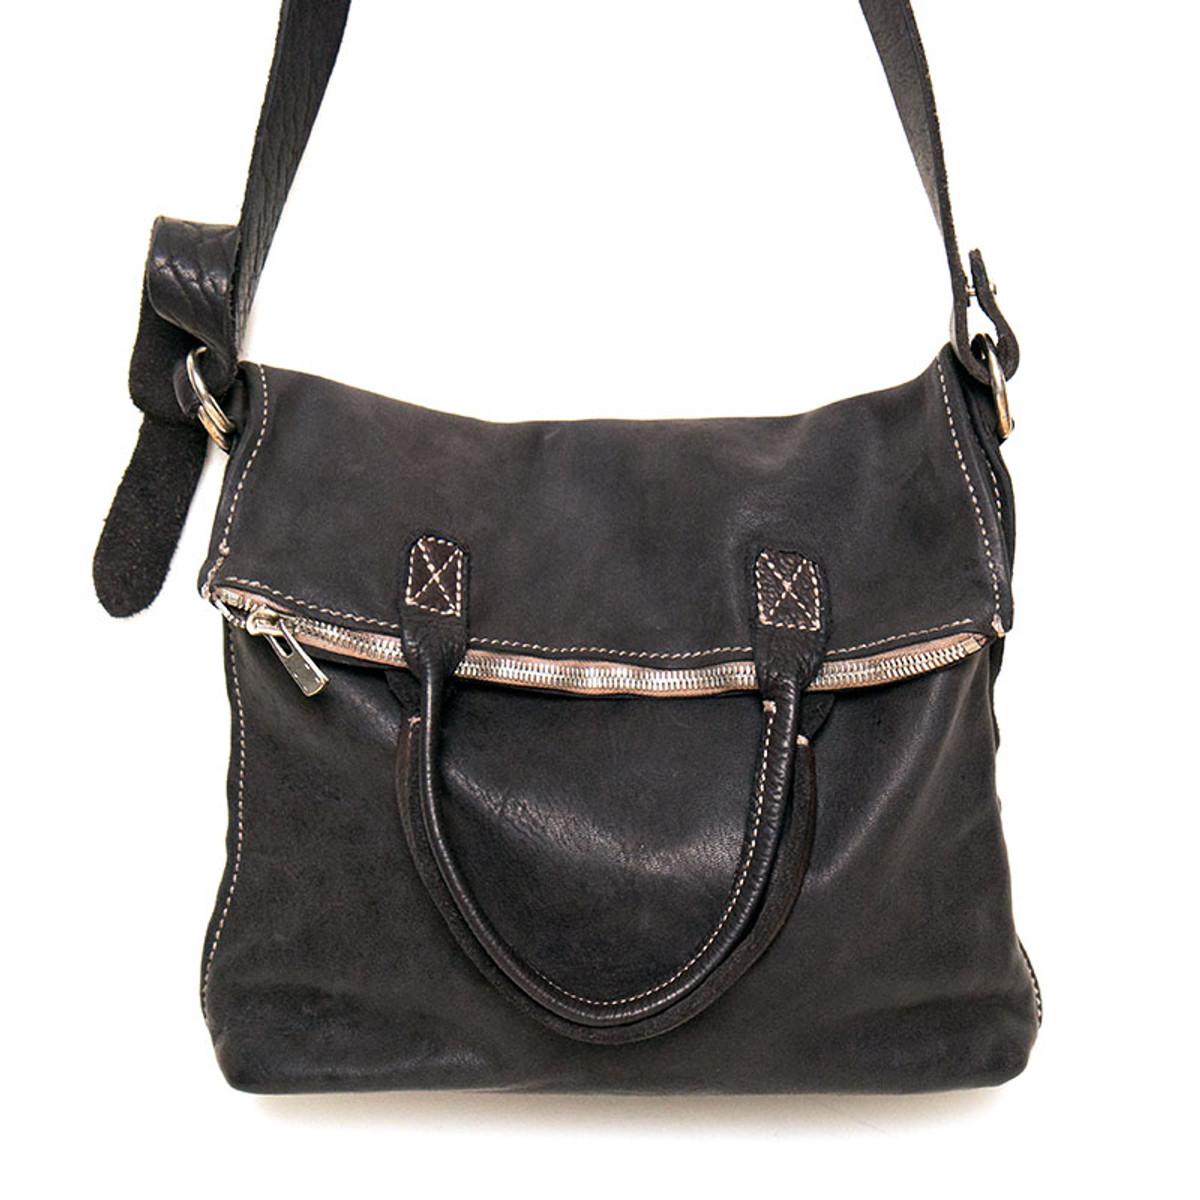 c974b16e5b67 Guidi Leather Messenger Bag